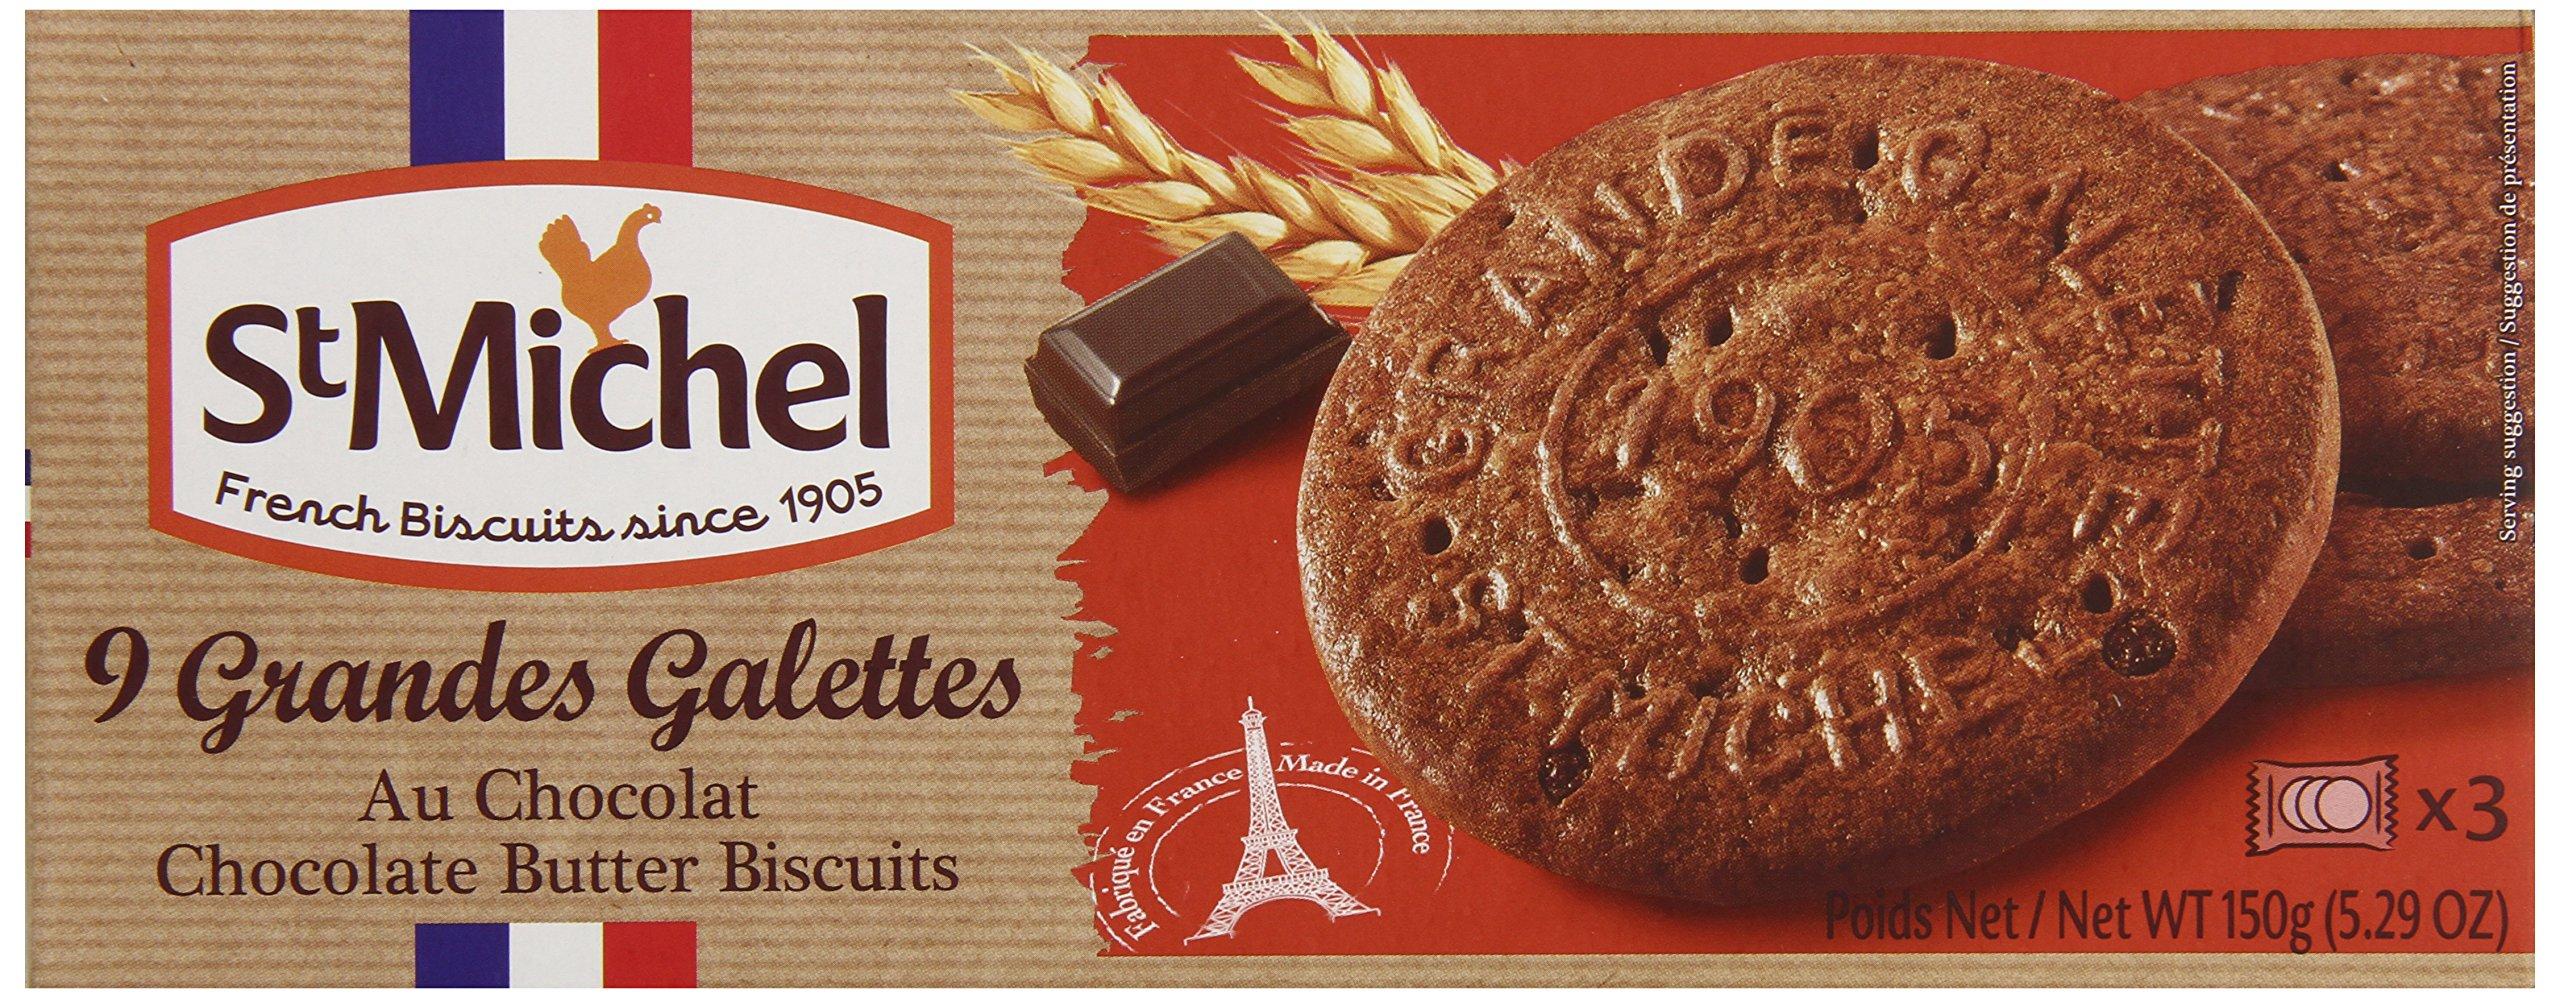 St Michel La Grande Galette Butter Cookies, Chocolate, 5.3 Ounce